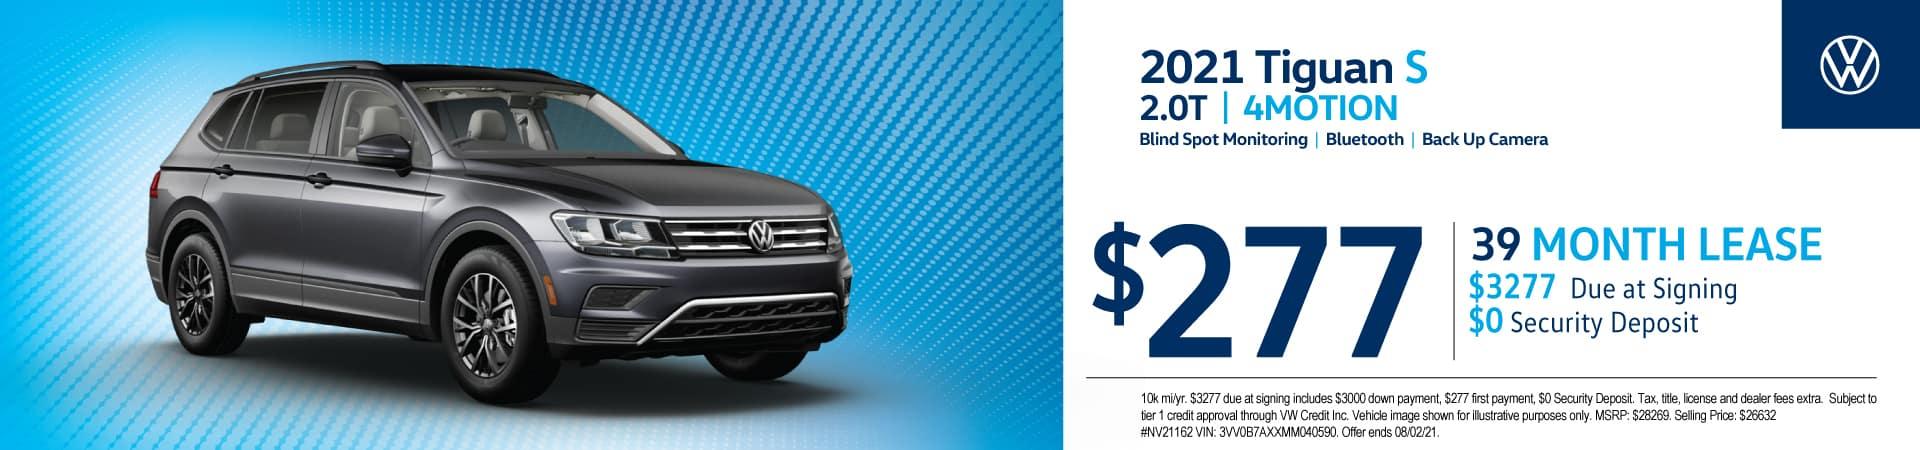 July-2021-VW-CS-Slides_2021-Tiguan-S